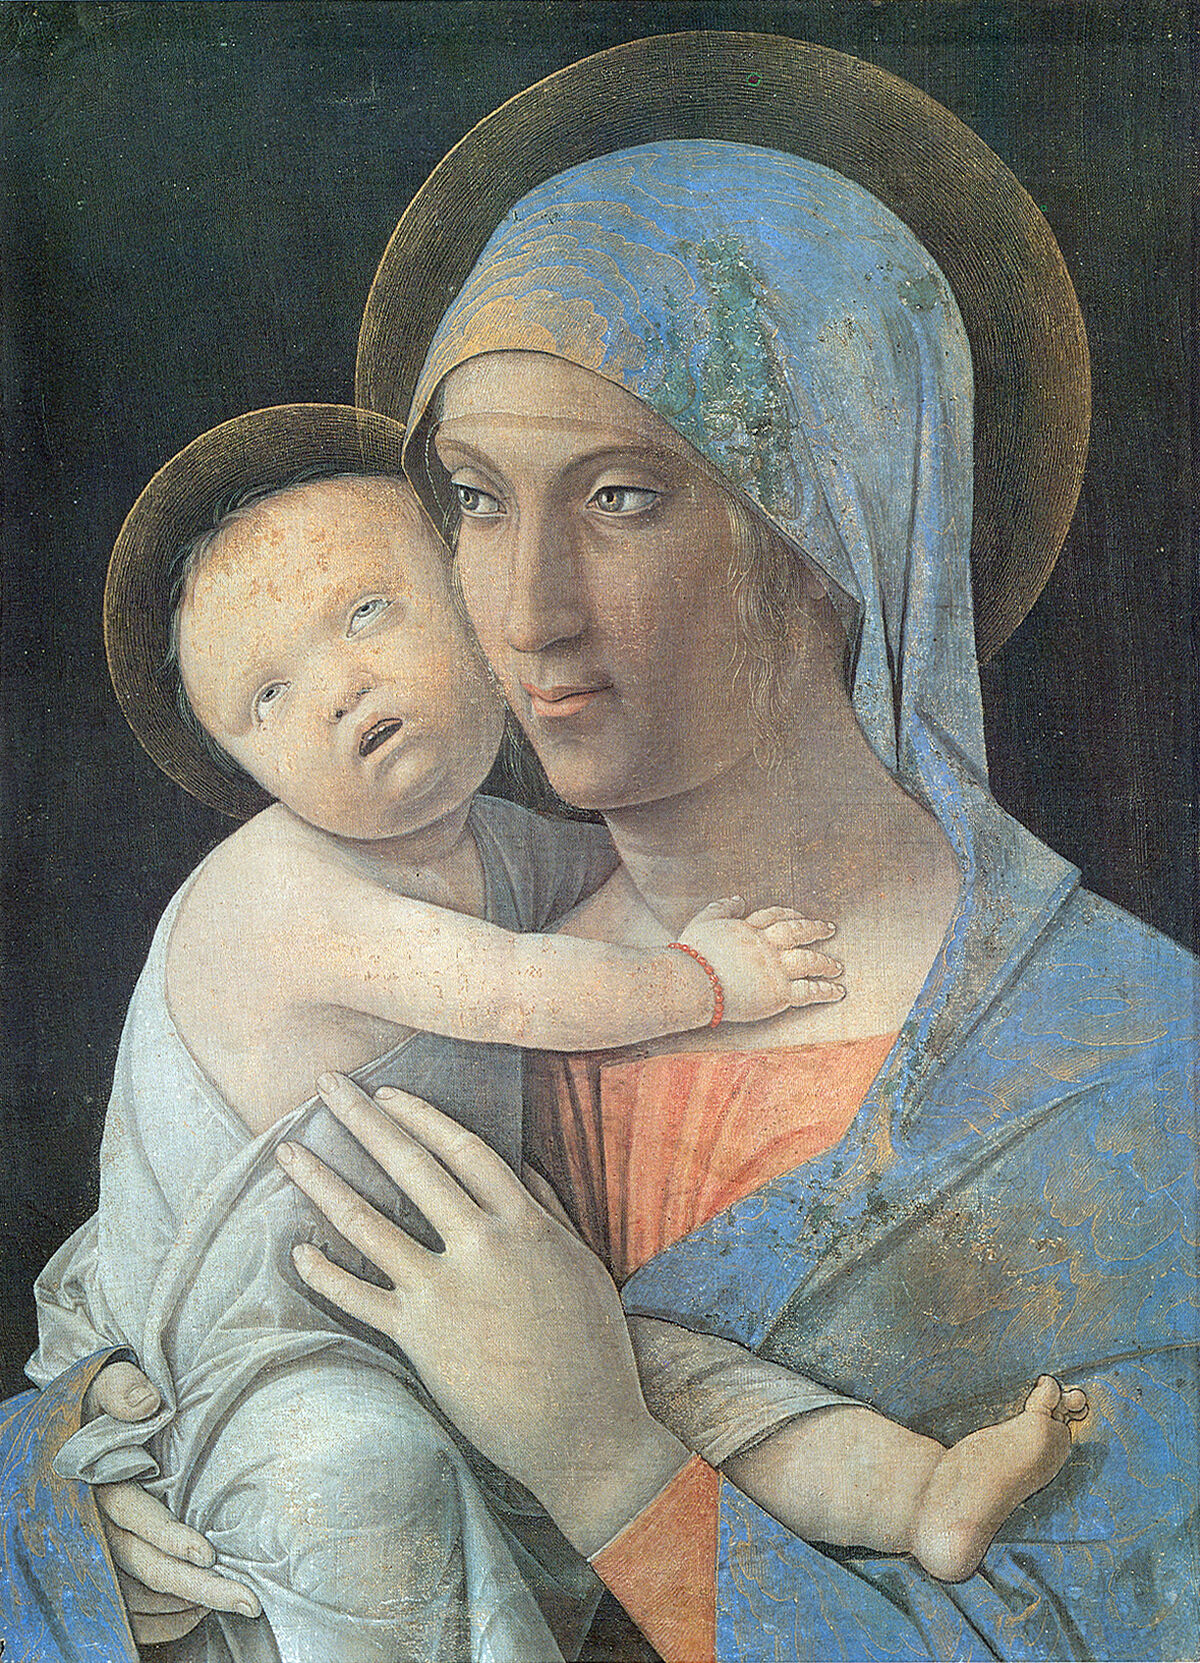 Andrea Mantegna, Madonna and Child, 1490–1500 or 1463–65. Image via Wikimedia Common.